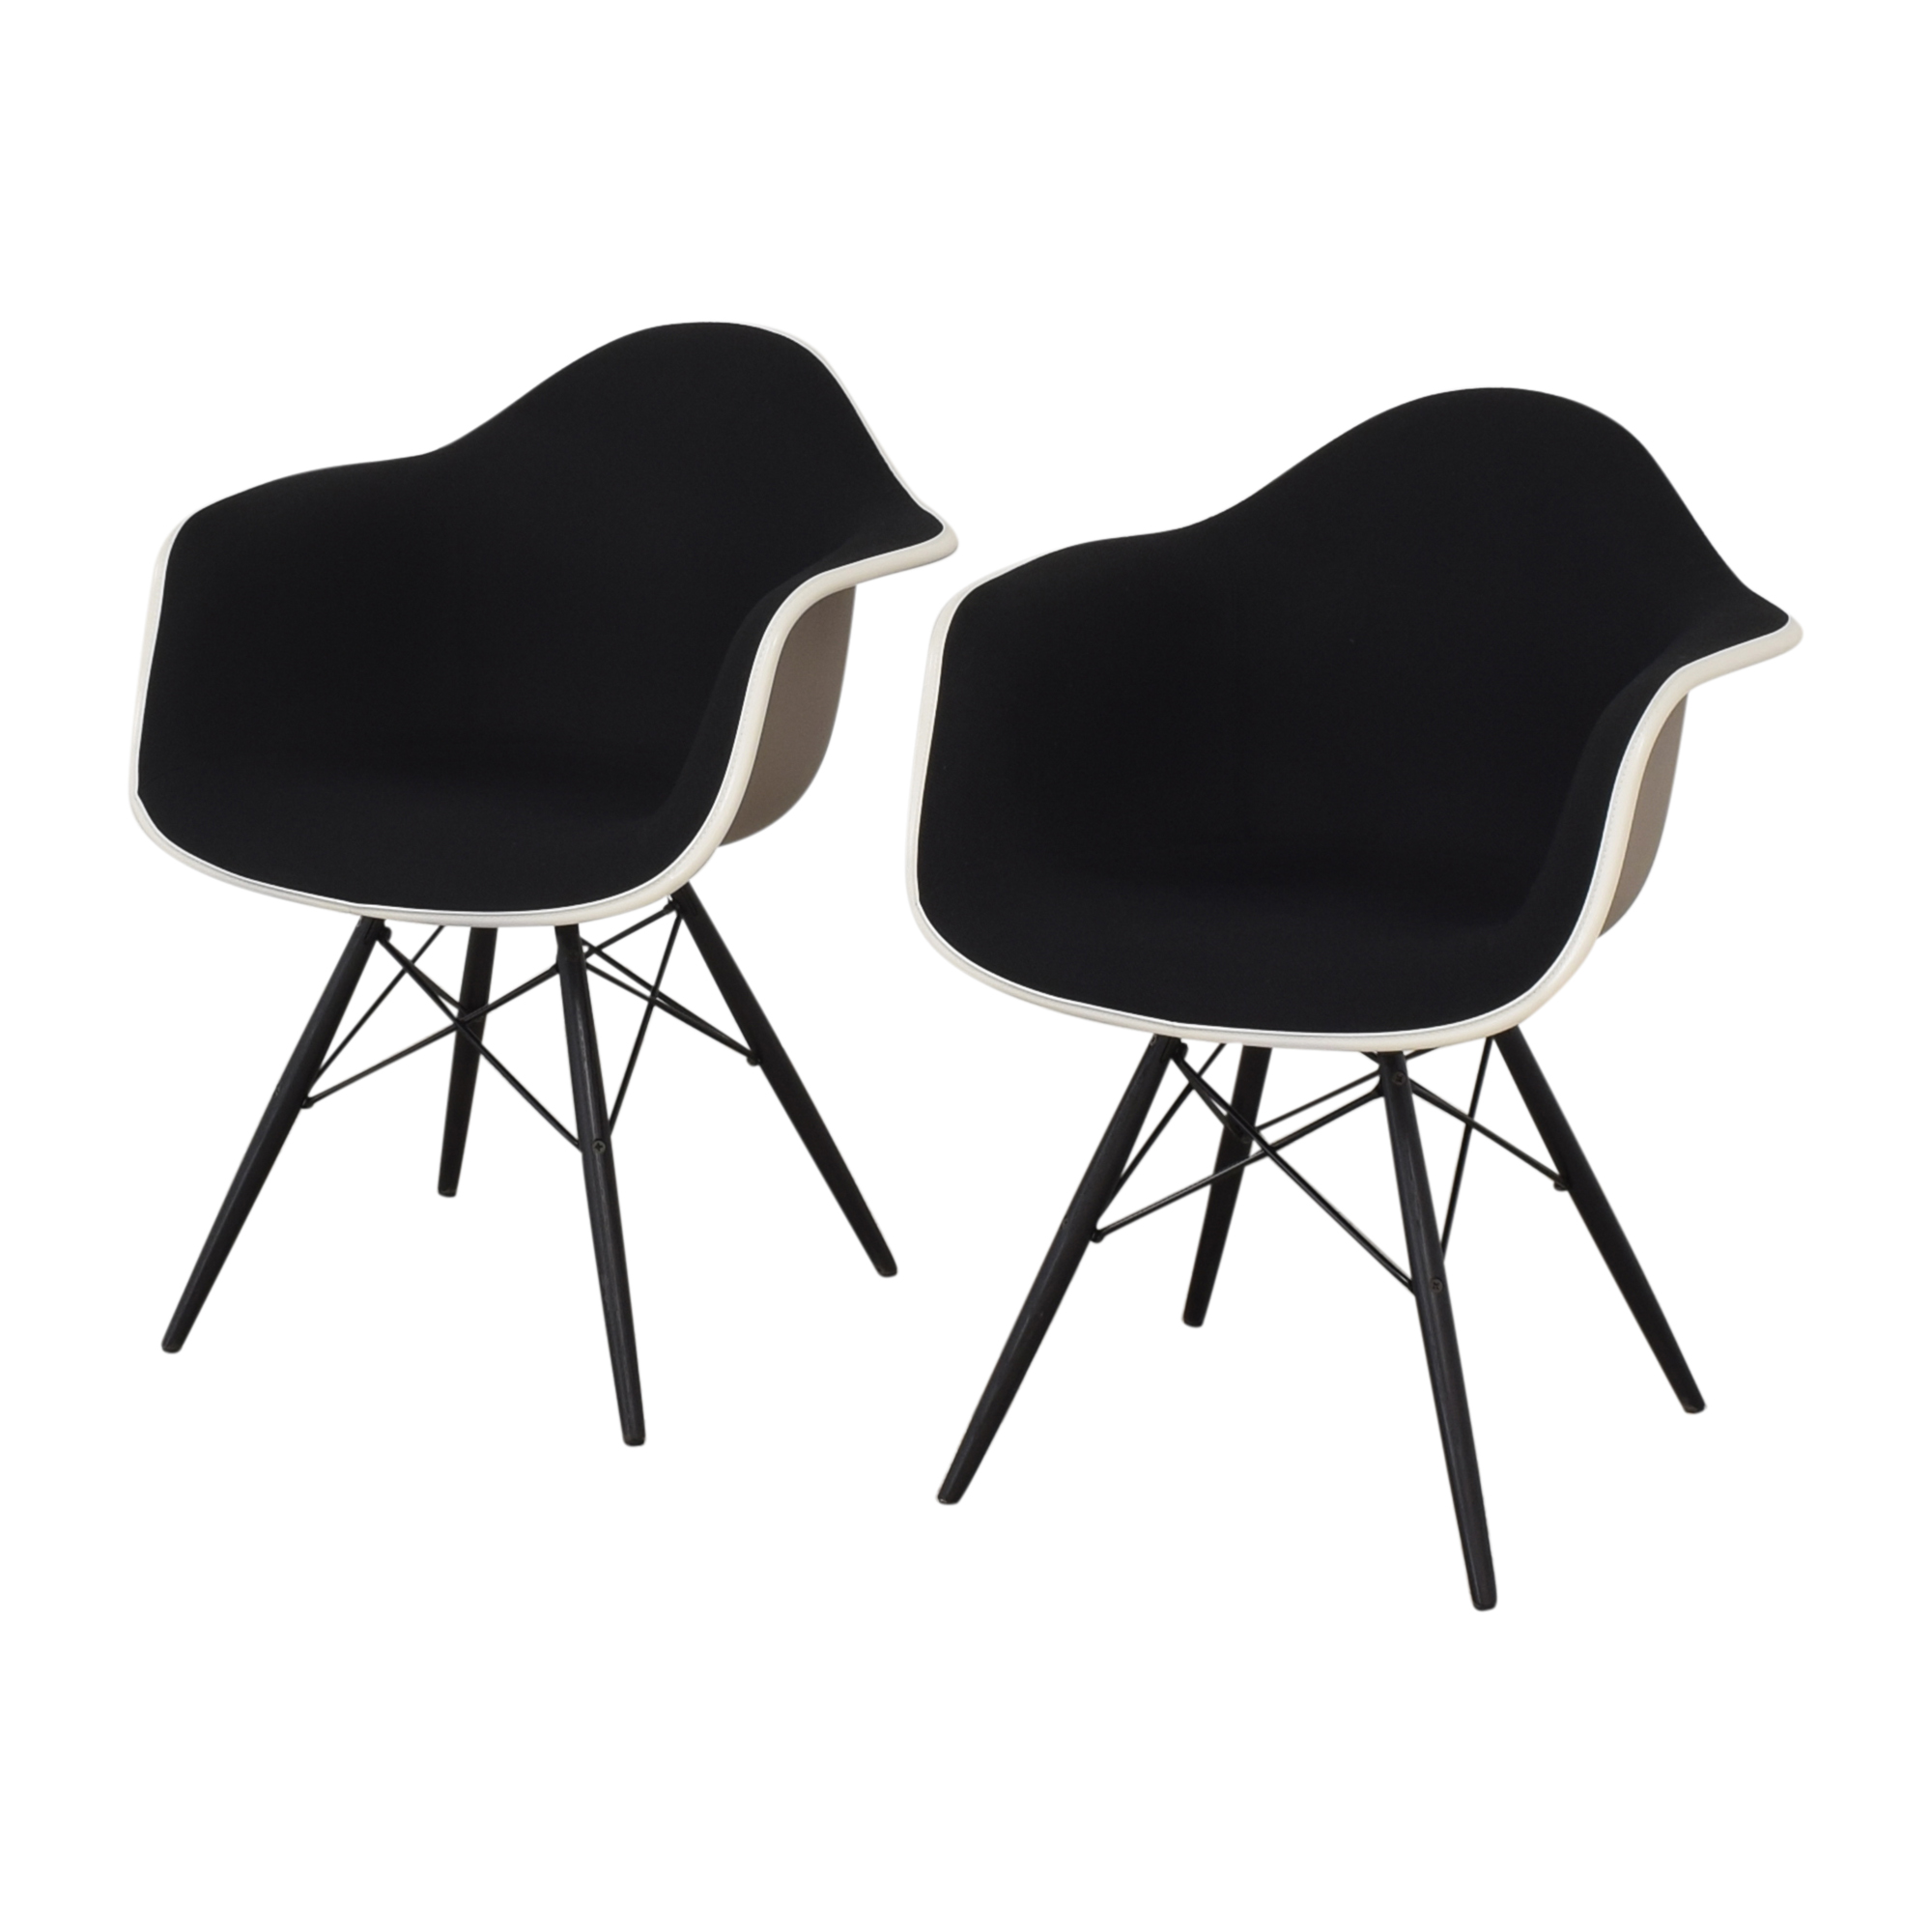 Herman Miller Herman Miller Eames Molded Arm Chairs discount